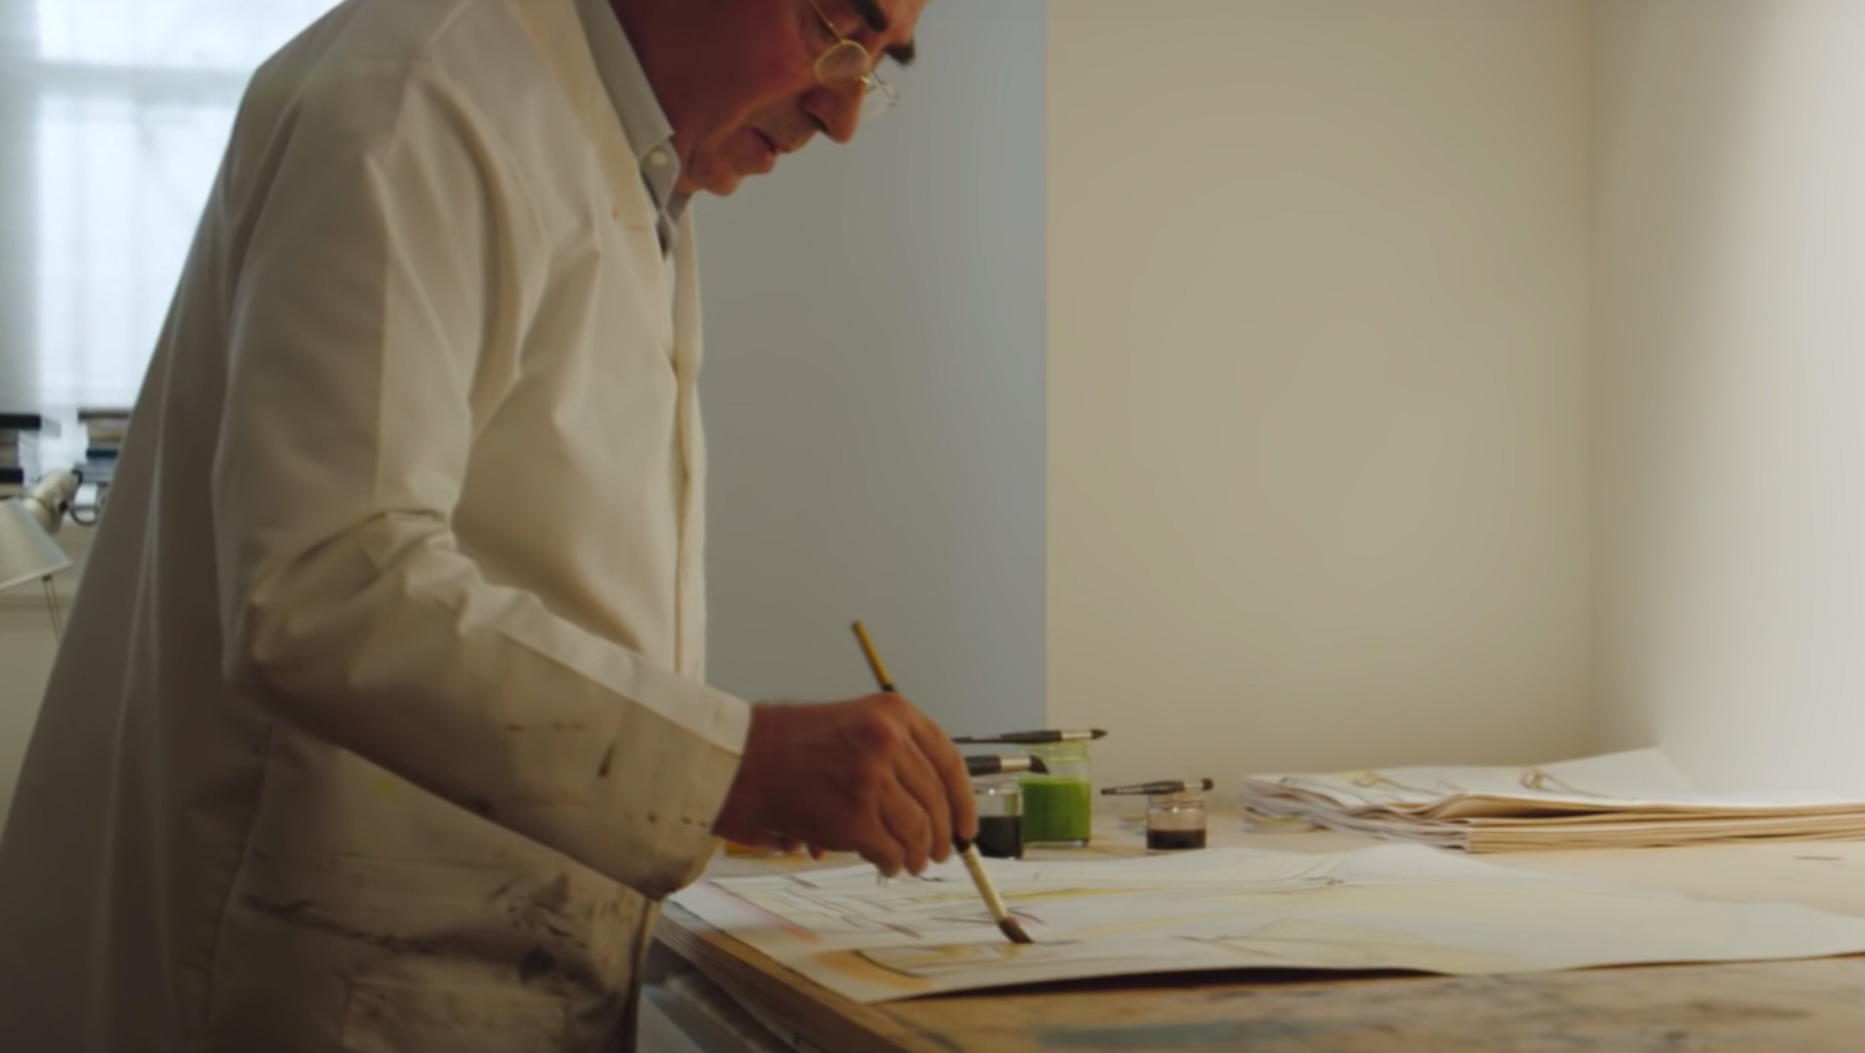 Santiago Calatrava's creative process subject of new documentary